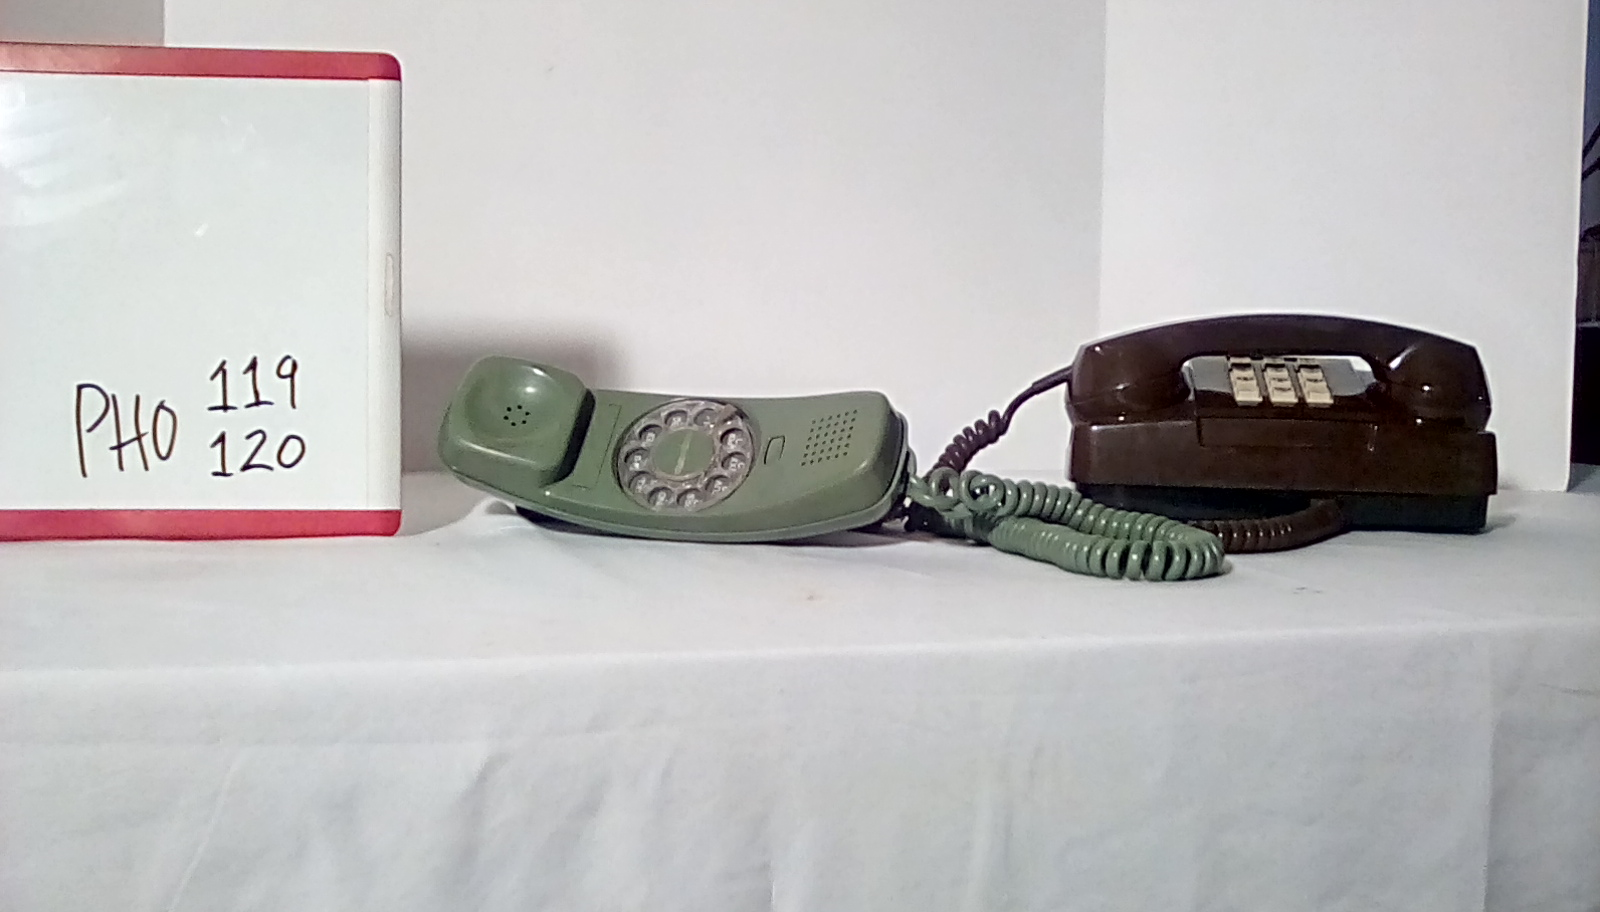 PHO119 Trimline green rotary desk phone, PHO120 brown 1970's princess push button desk phone